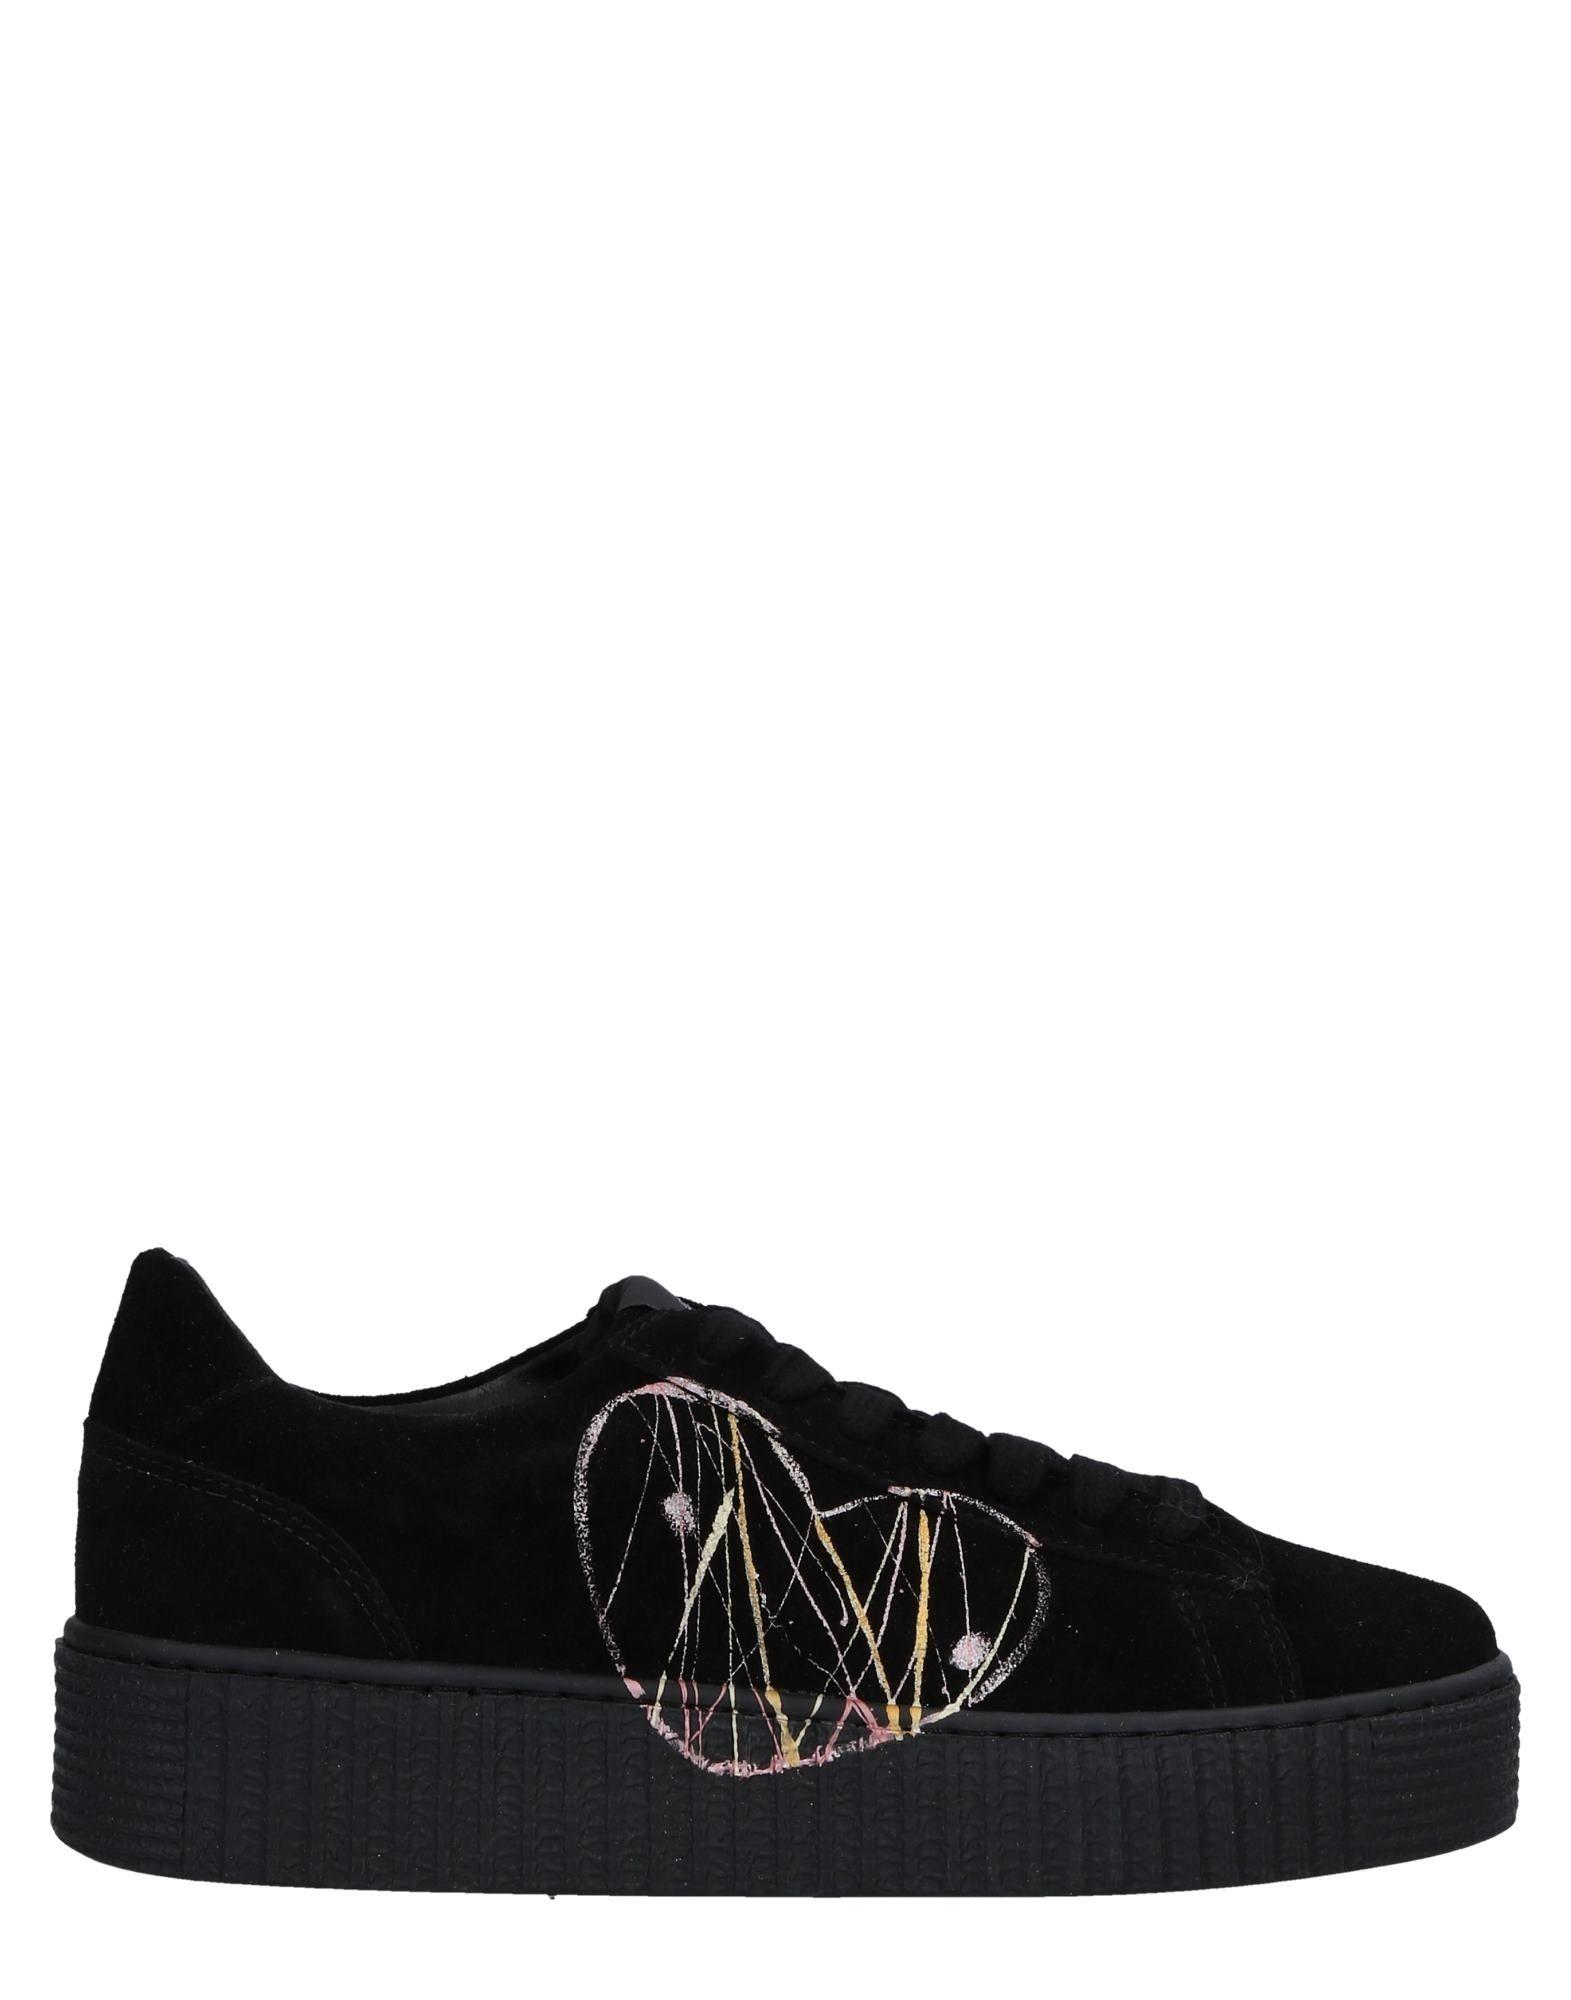 Nira Rubens Sneakers Damen  11512327EQ Gute Qualität beliebte Schuhe